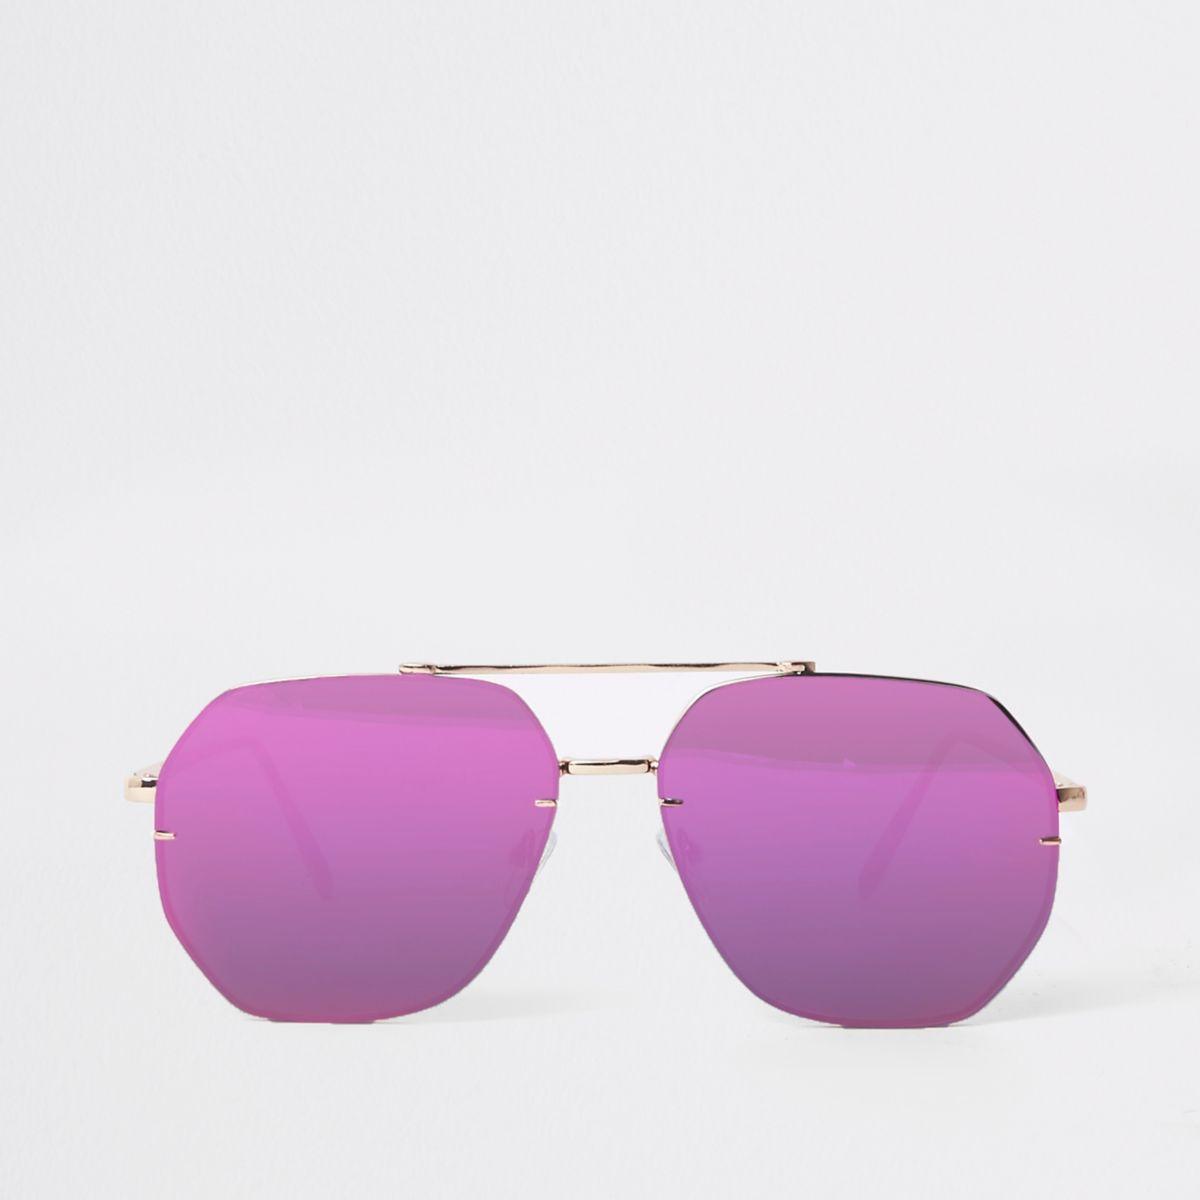 Pink mirror lens aviator sunglasses